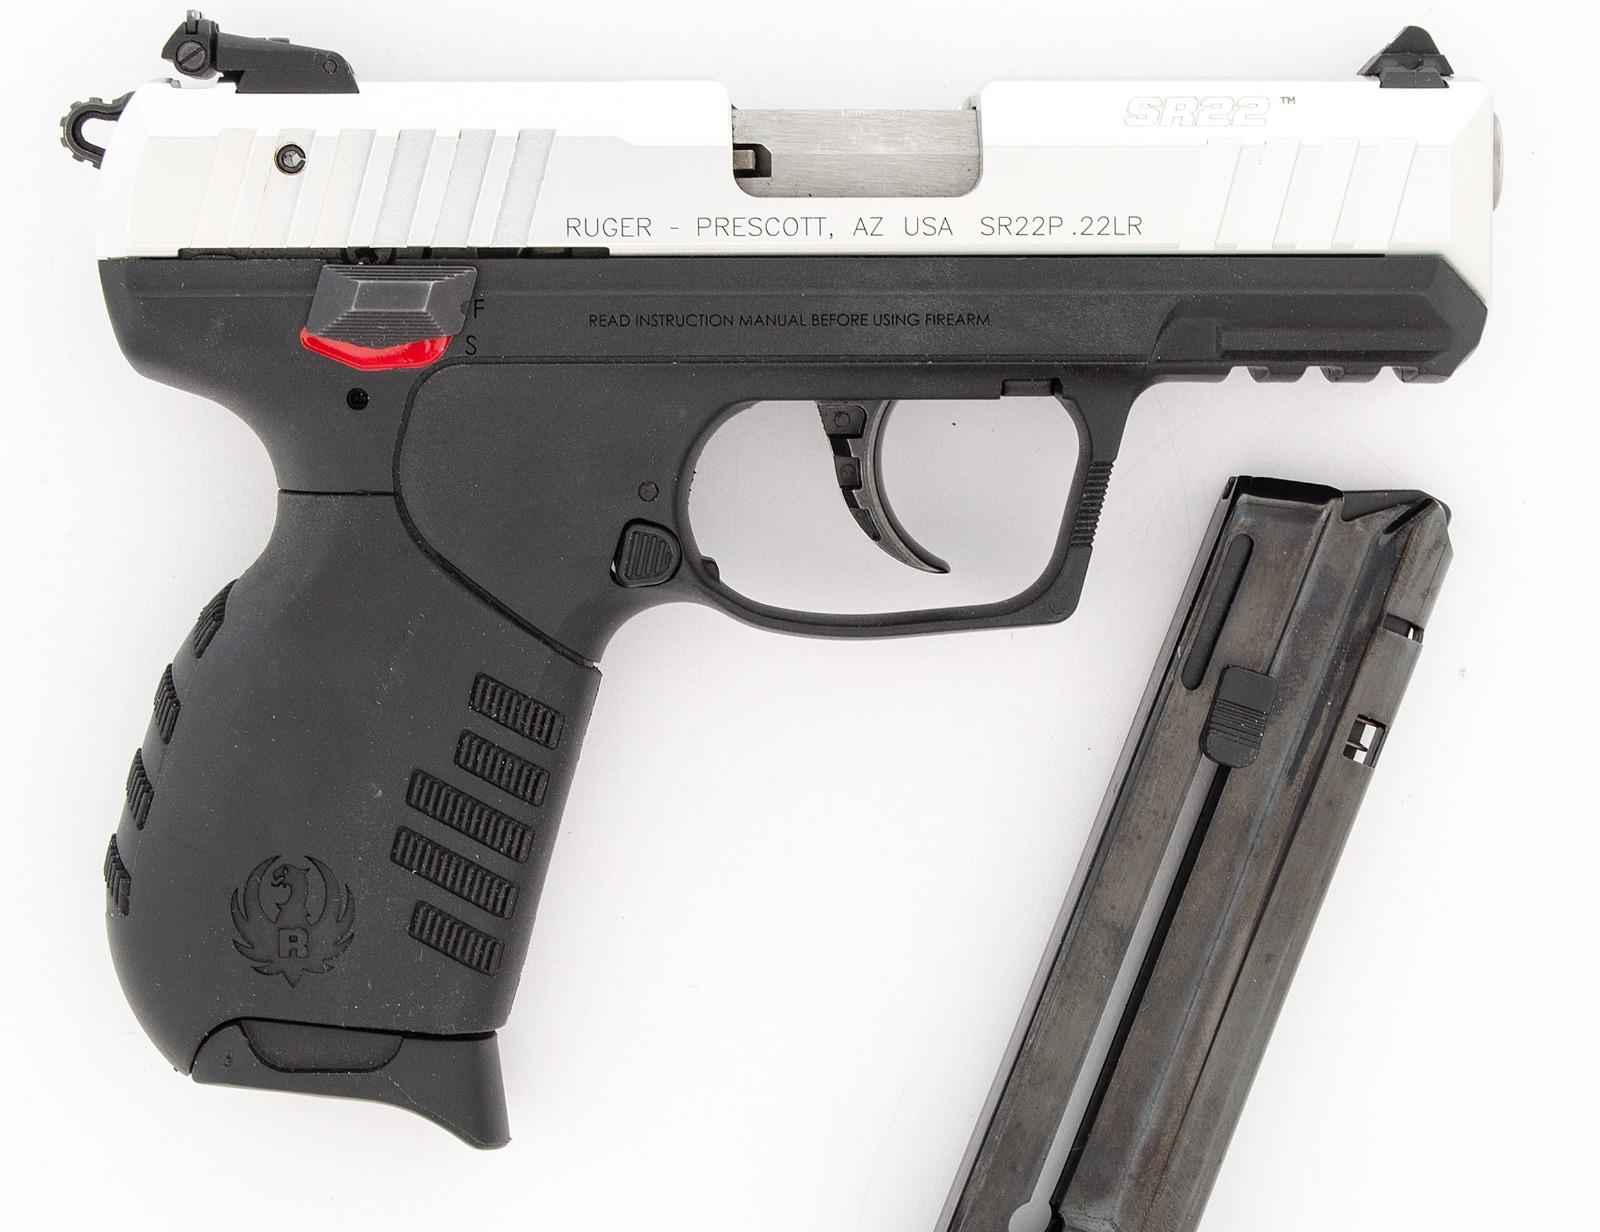 Wonder Gun Ruger S Sr22 Pistol Can Do